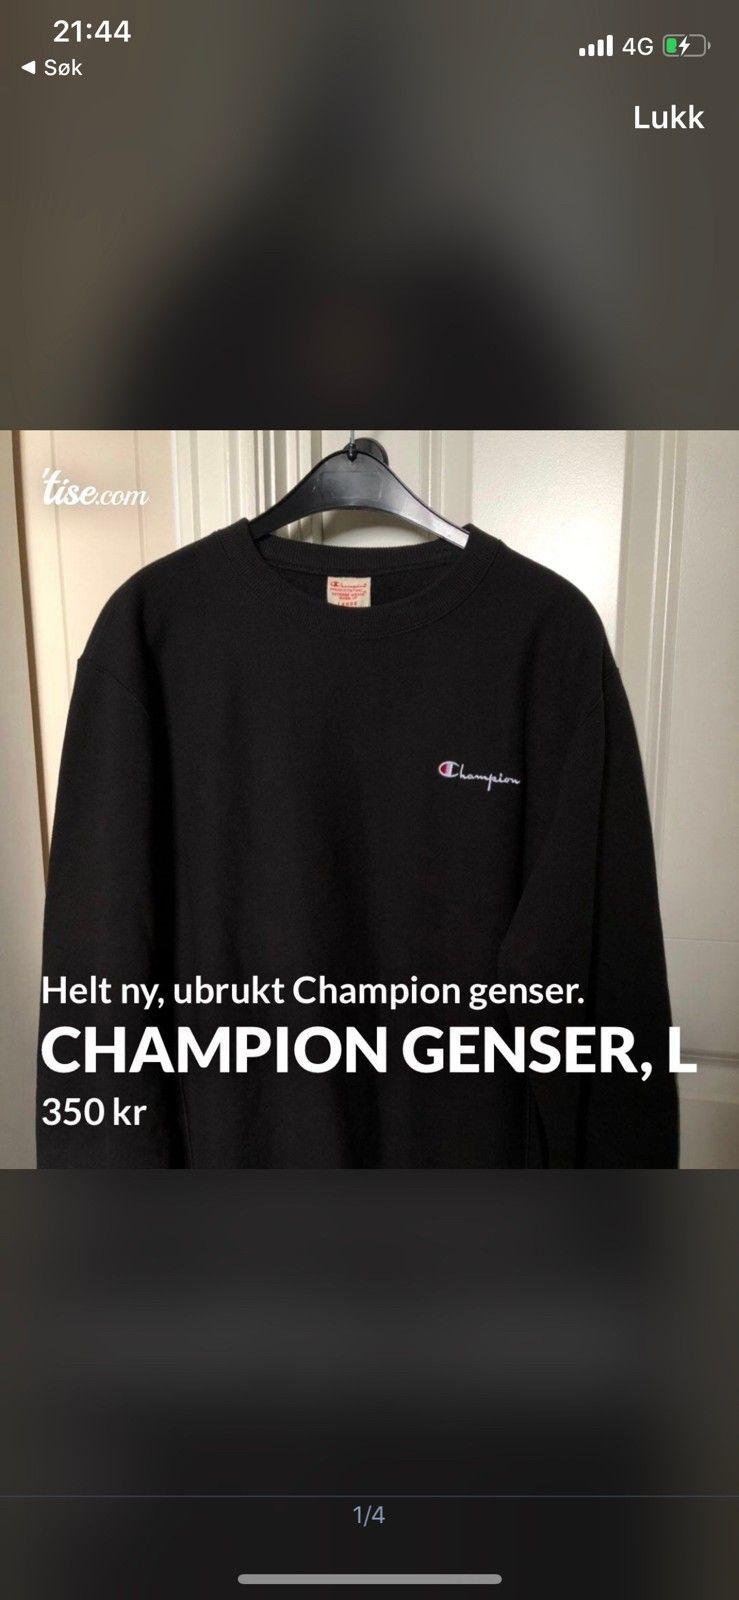 Champions Reverse Weave Genser   FINN.no